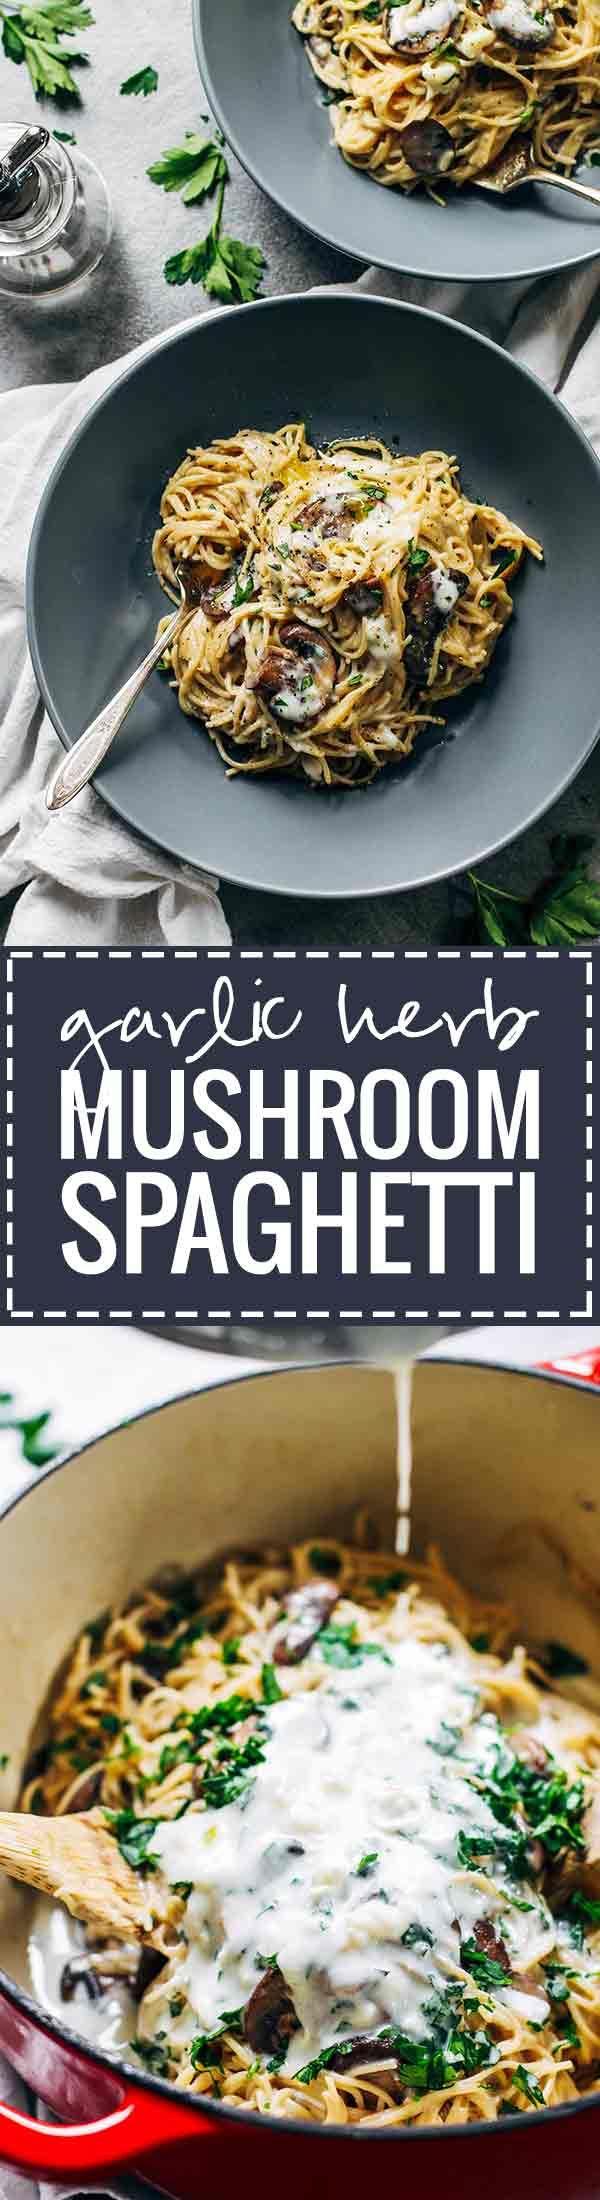 Photo of Creamy Garlic Herb Mushroom Spaghetti – Pinch of Yum